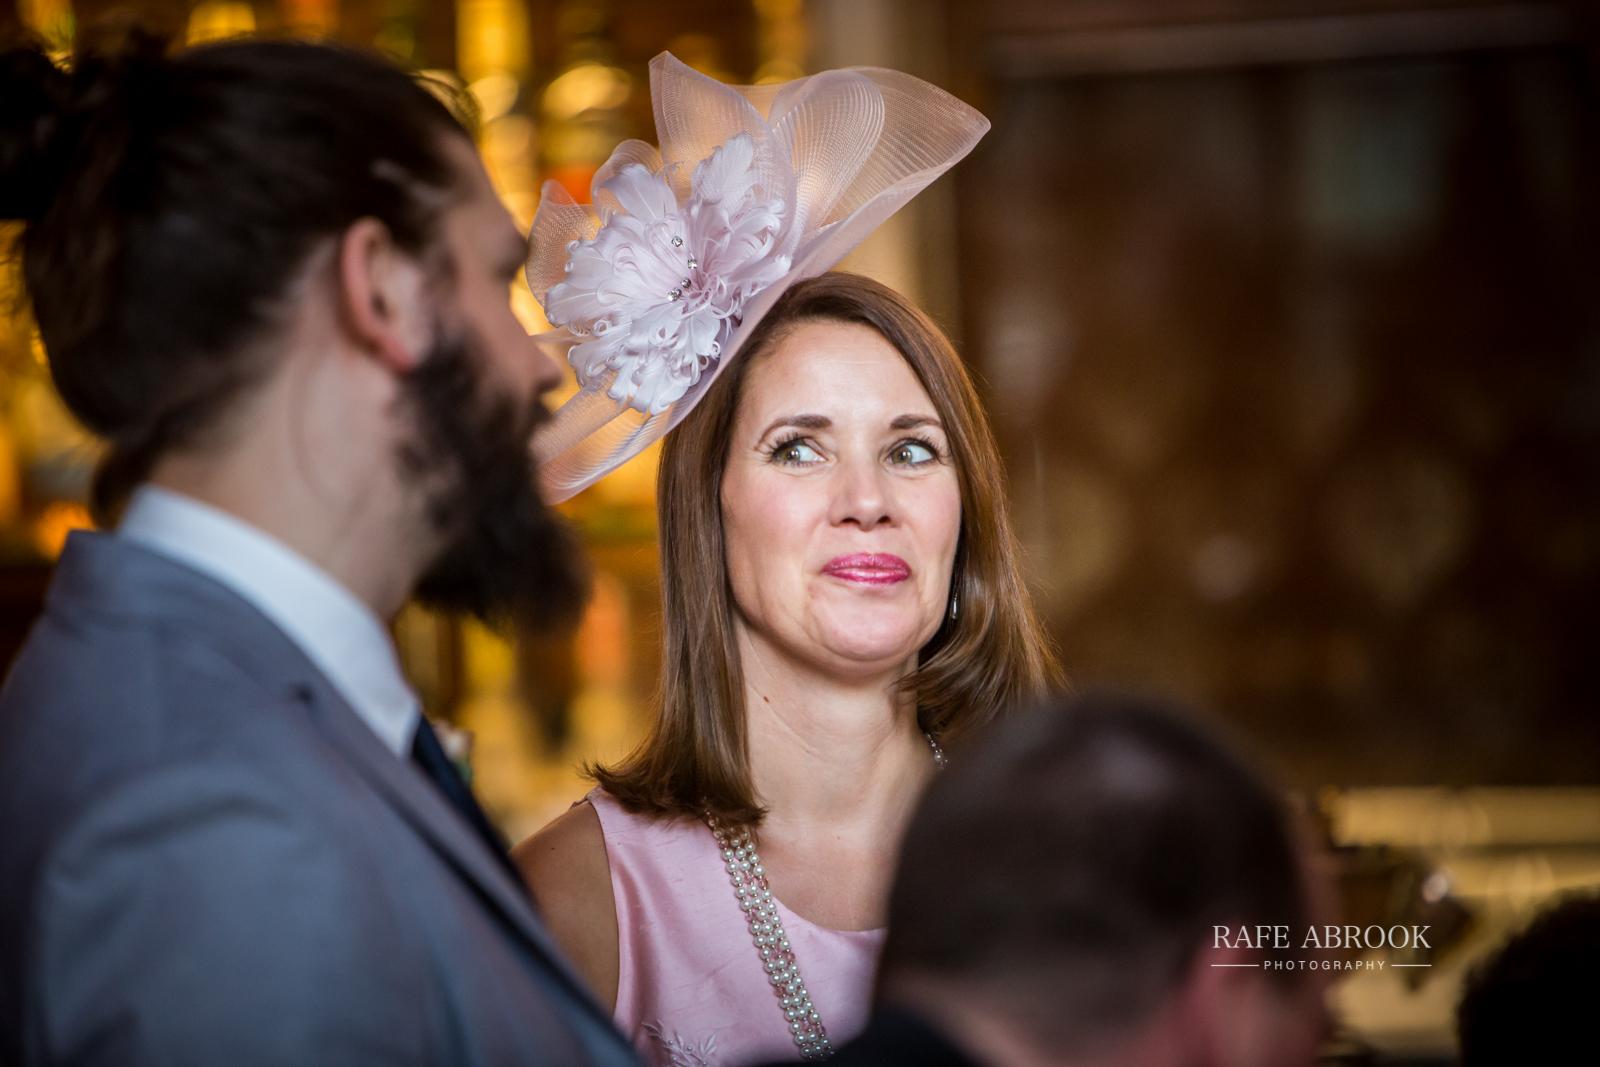 wedding photographer hertfordshire london st pancras renaissance hotel station grand staircase-1017.jpg